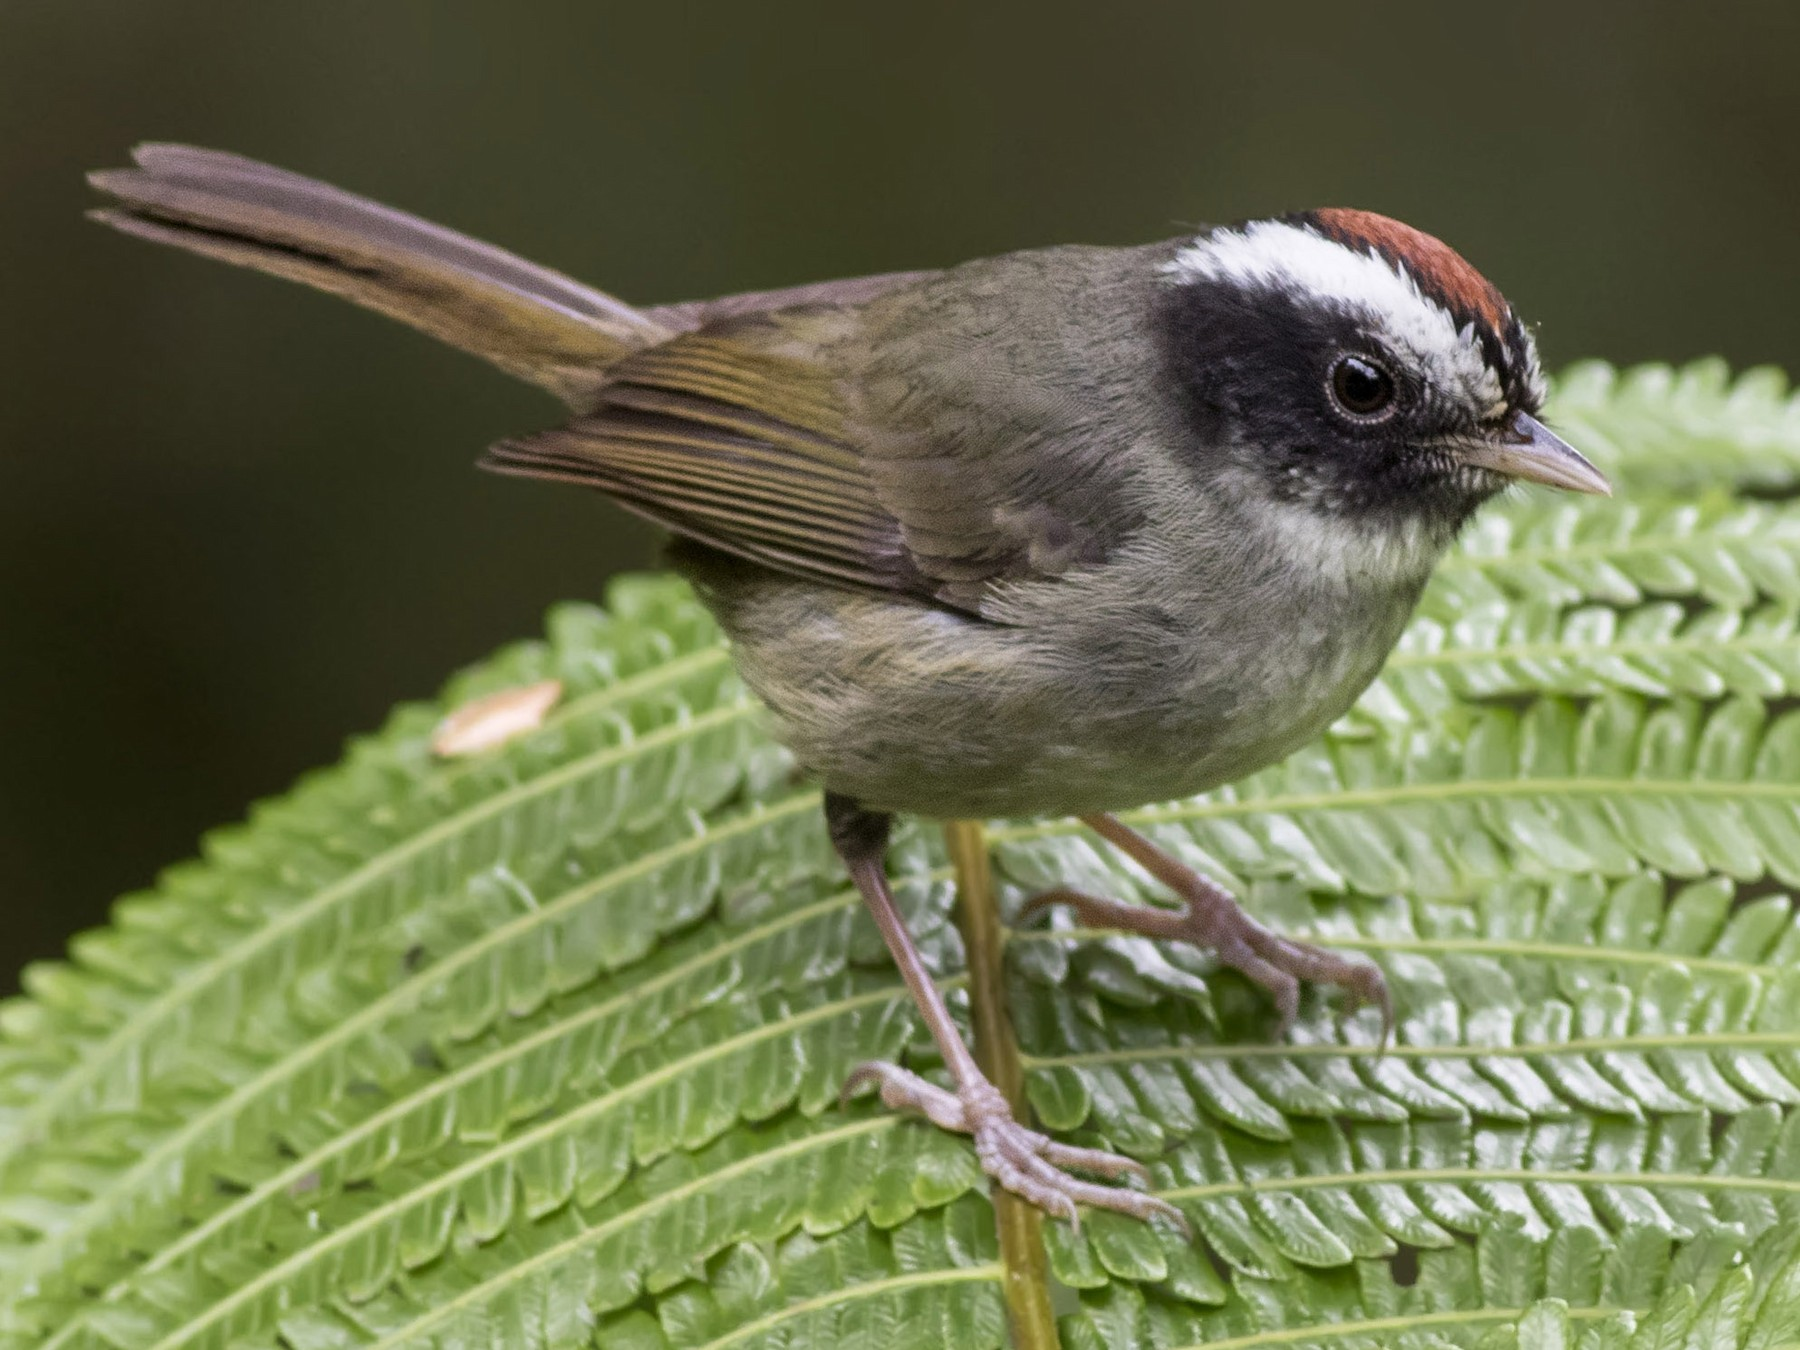 Black-cheeked Warbler - Guillermo  Saborío Vega